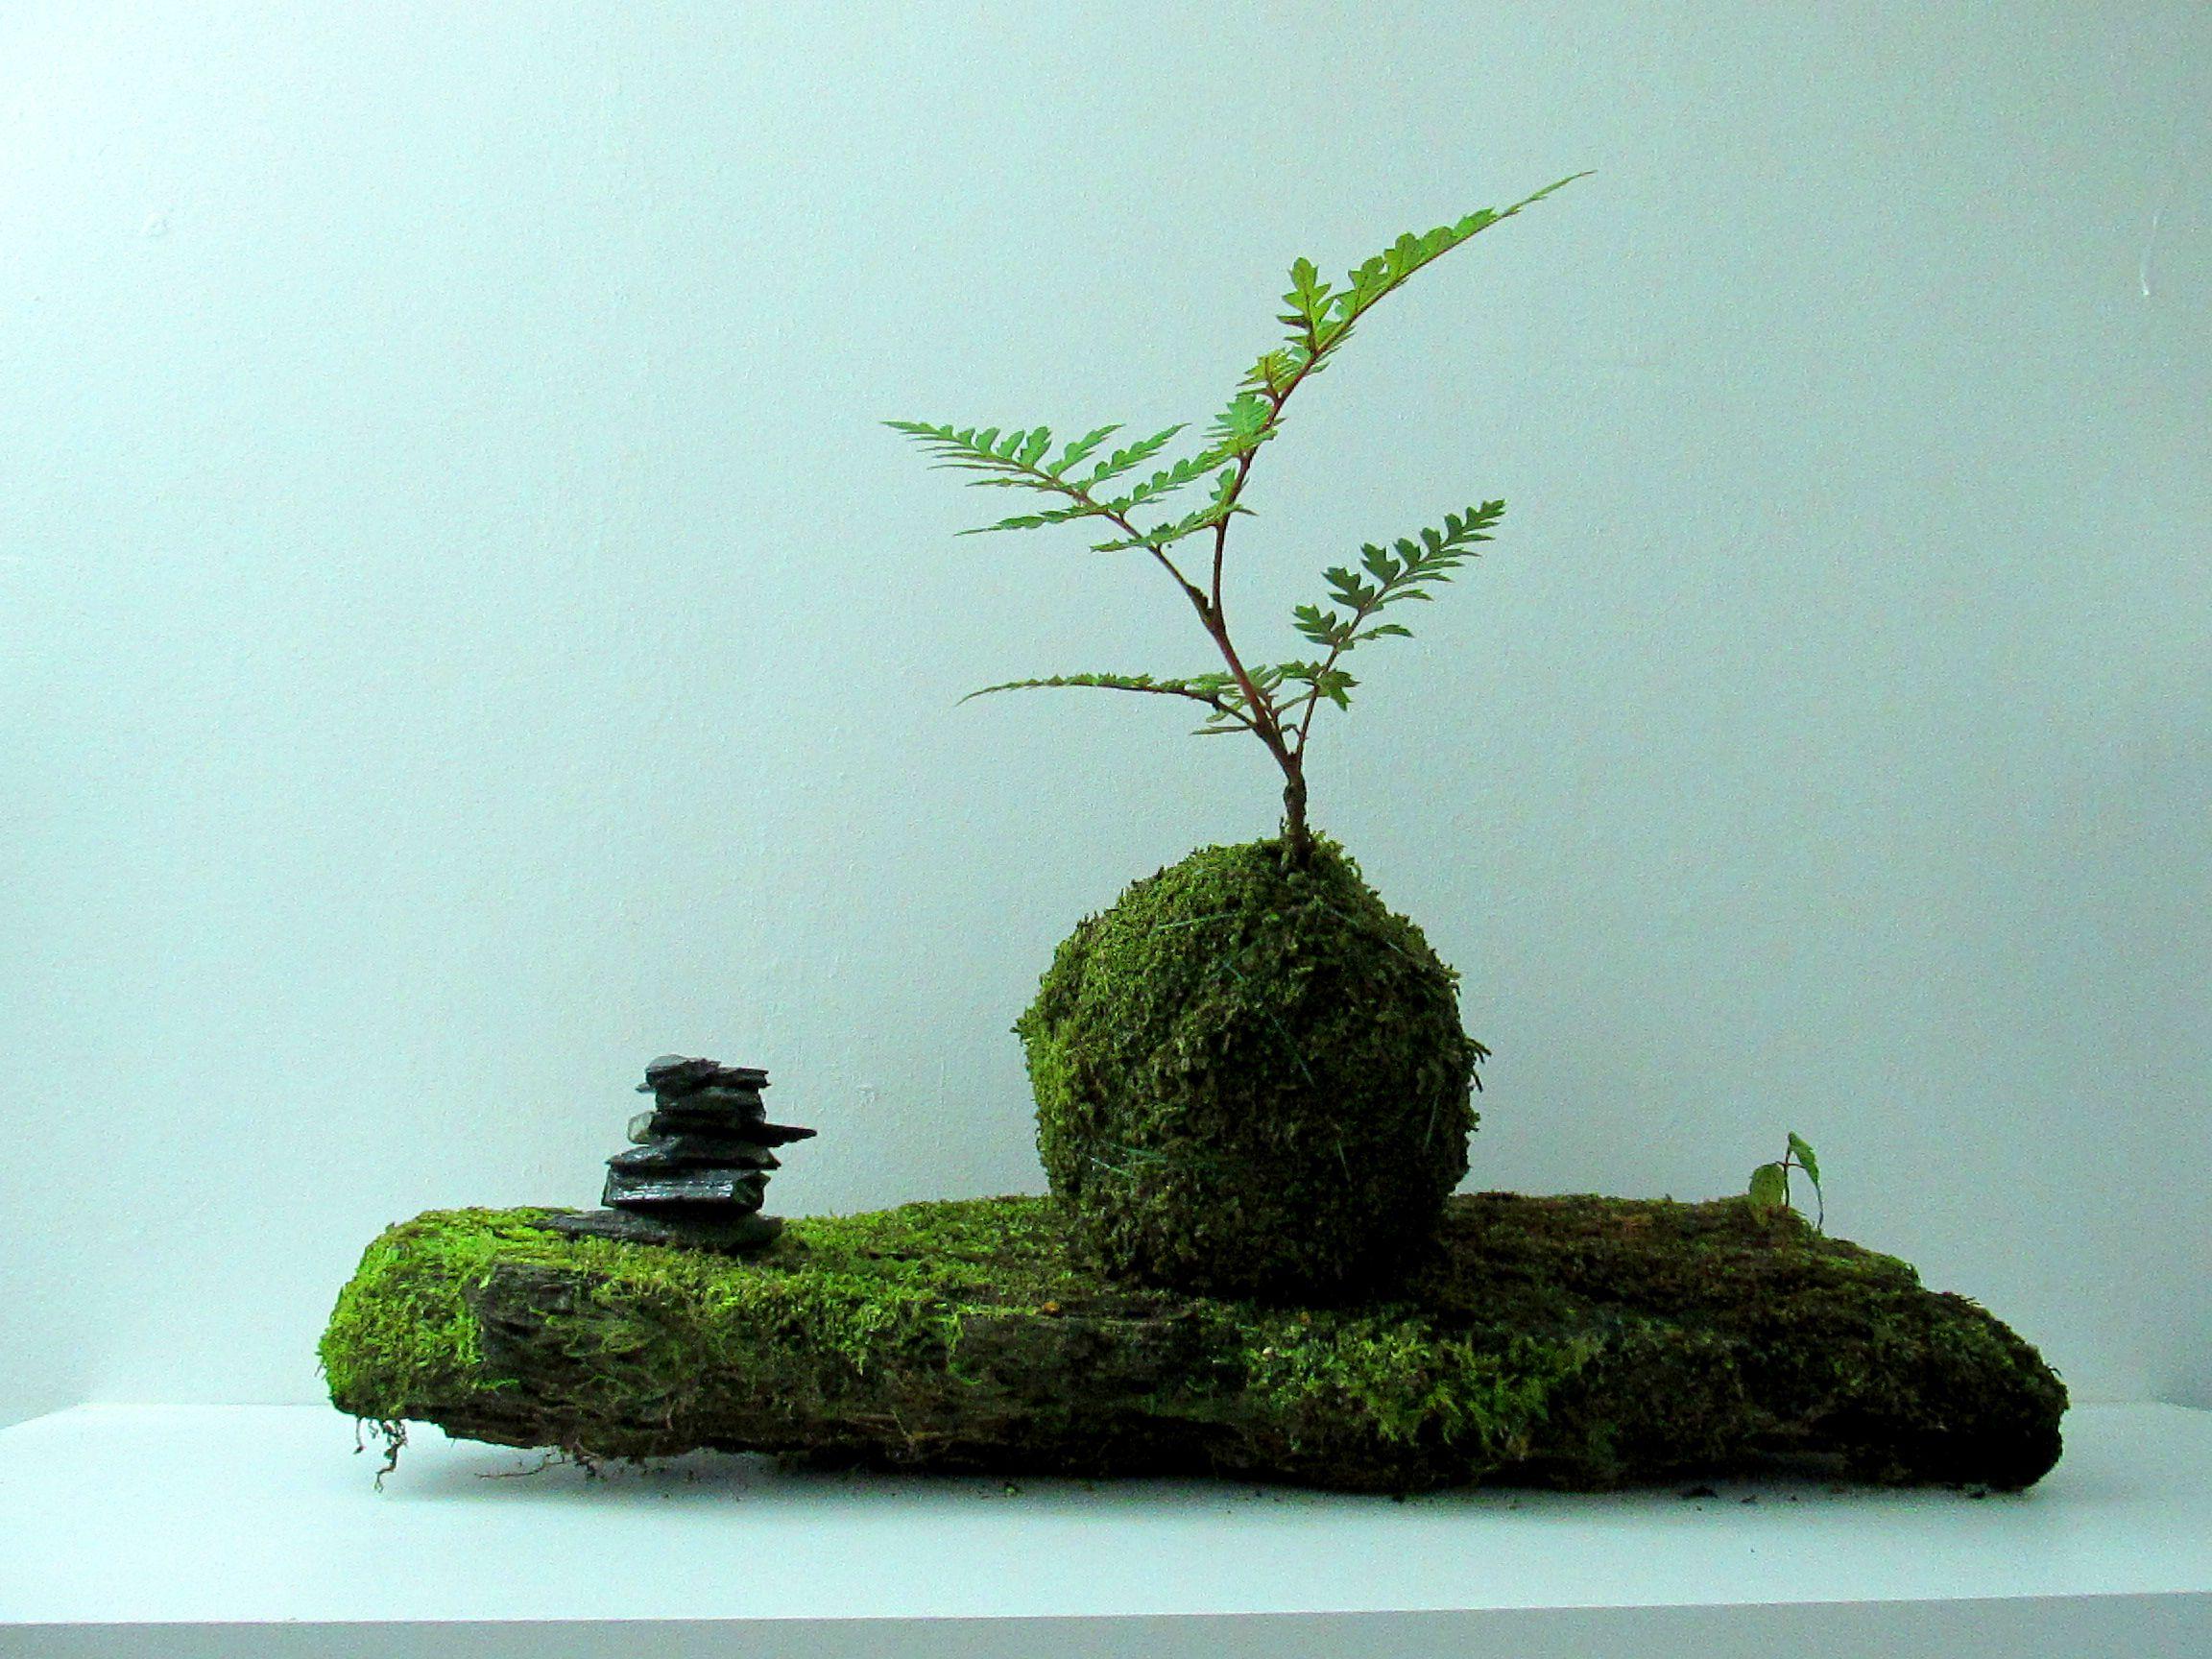 How to Make a Kokedama—The Japanese Art of the Moss Ball